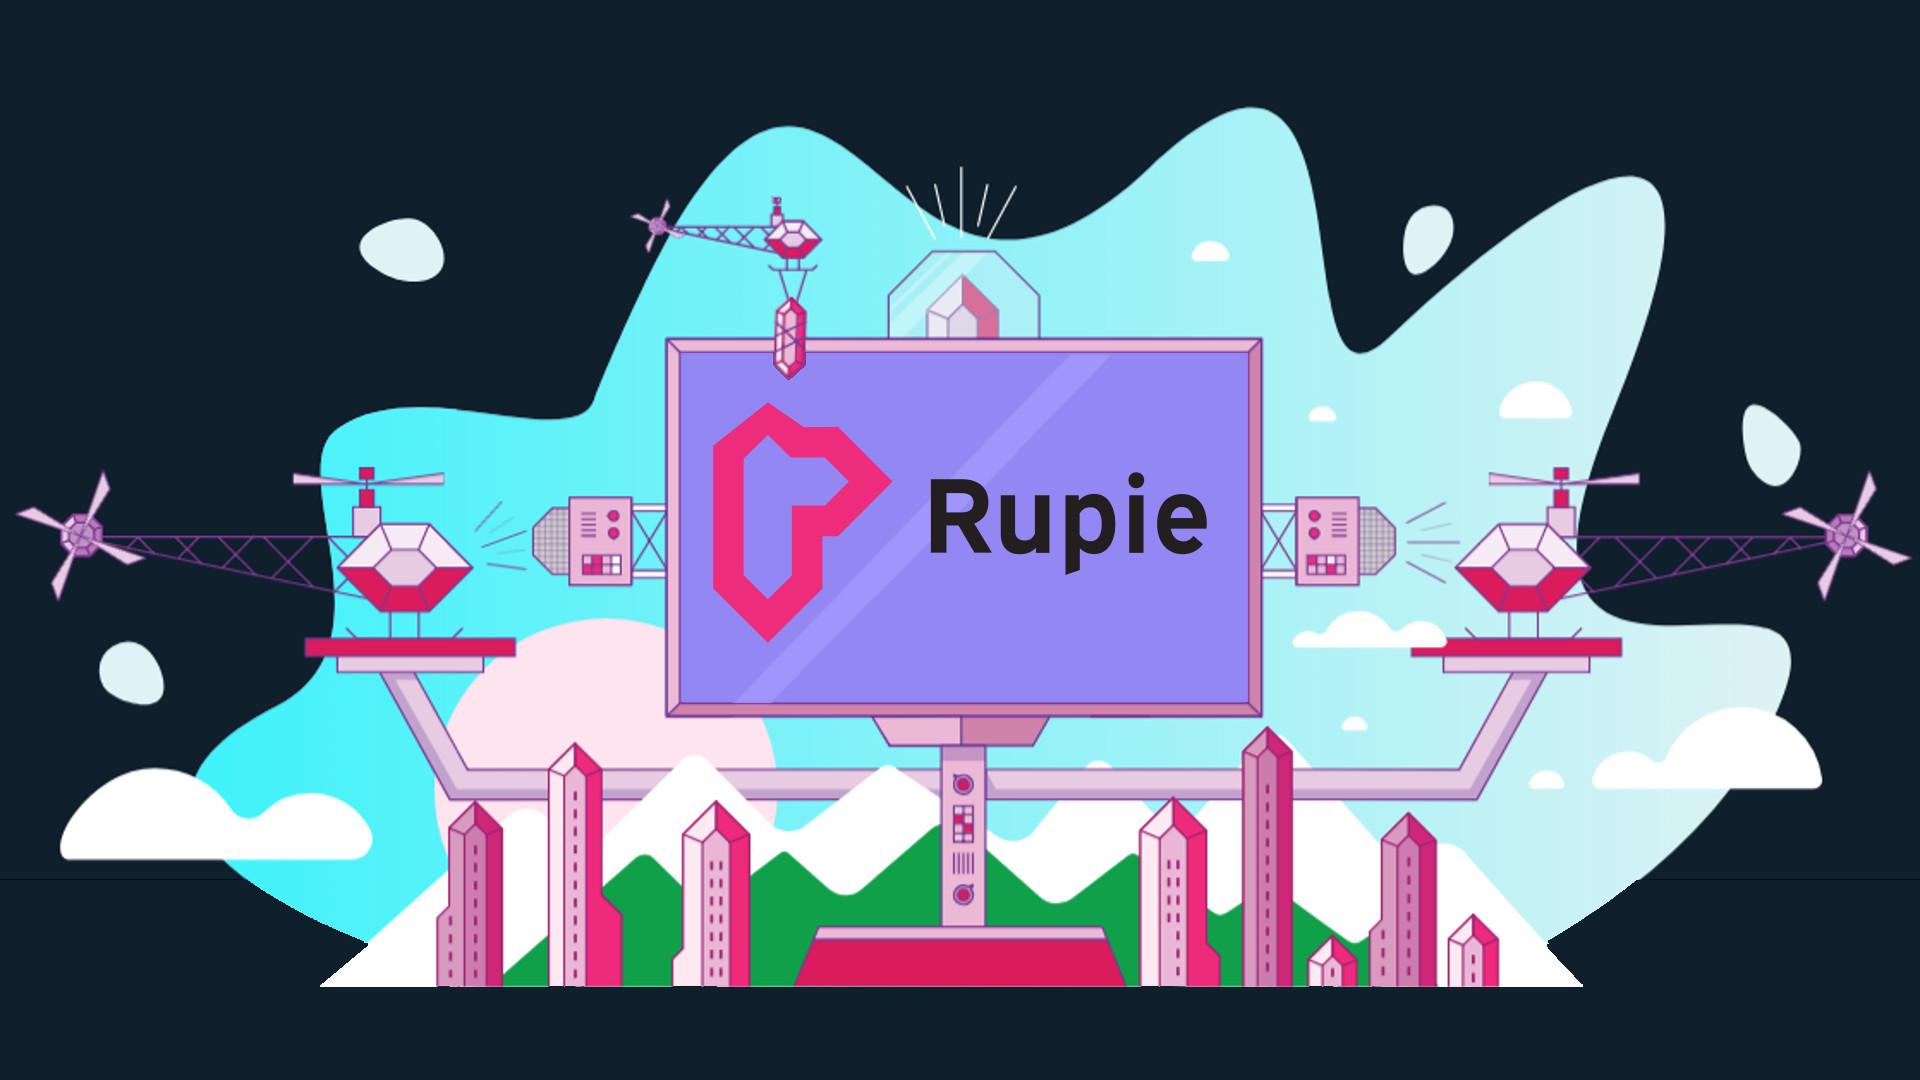 rupie-billboard.jpg